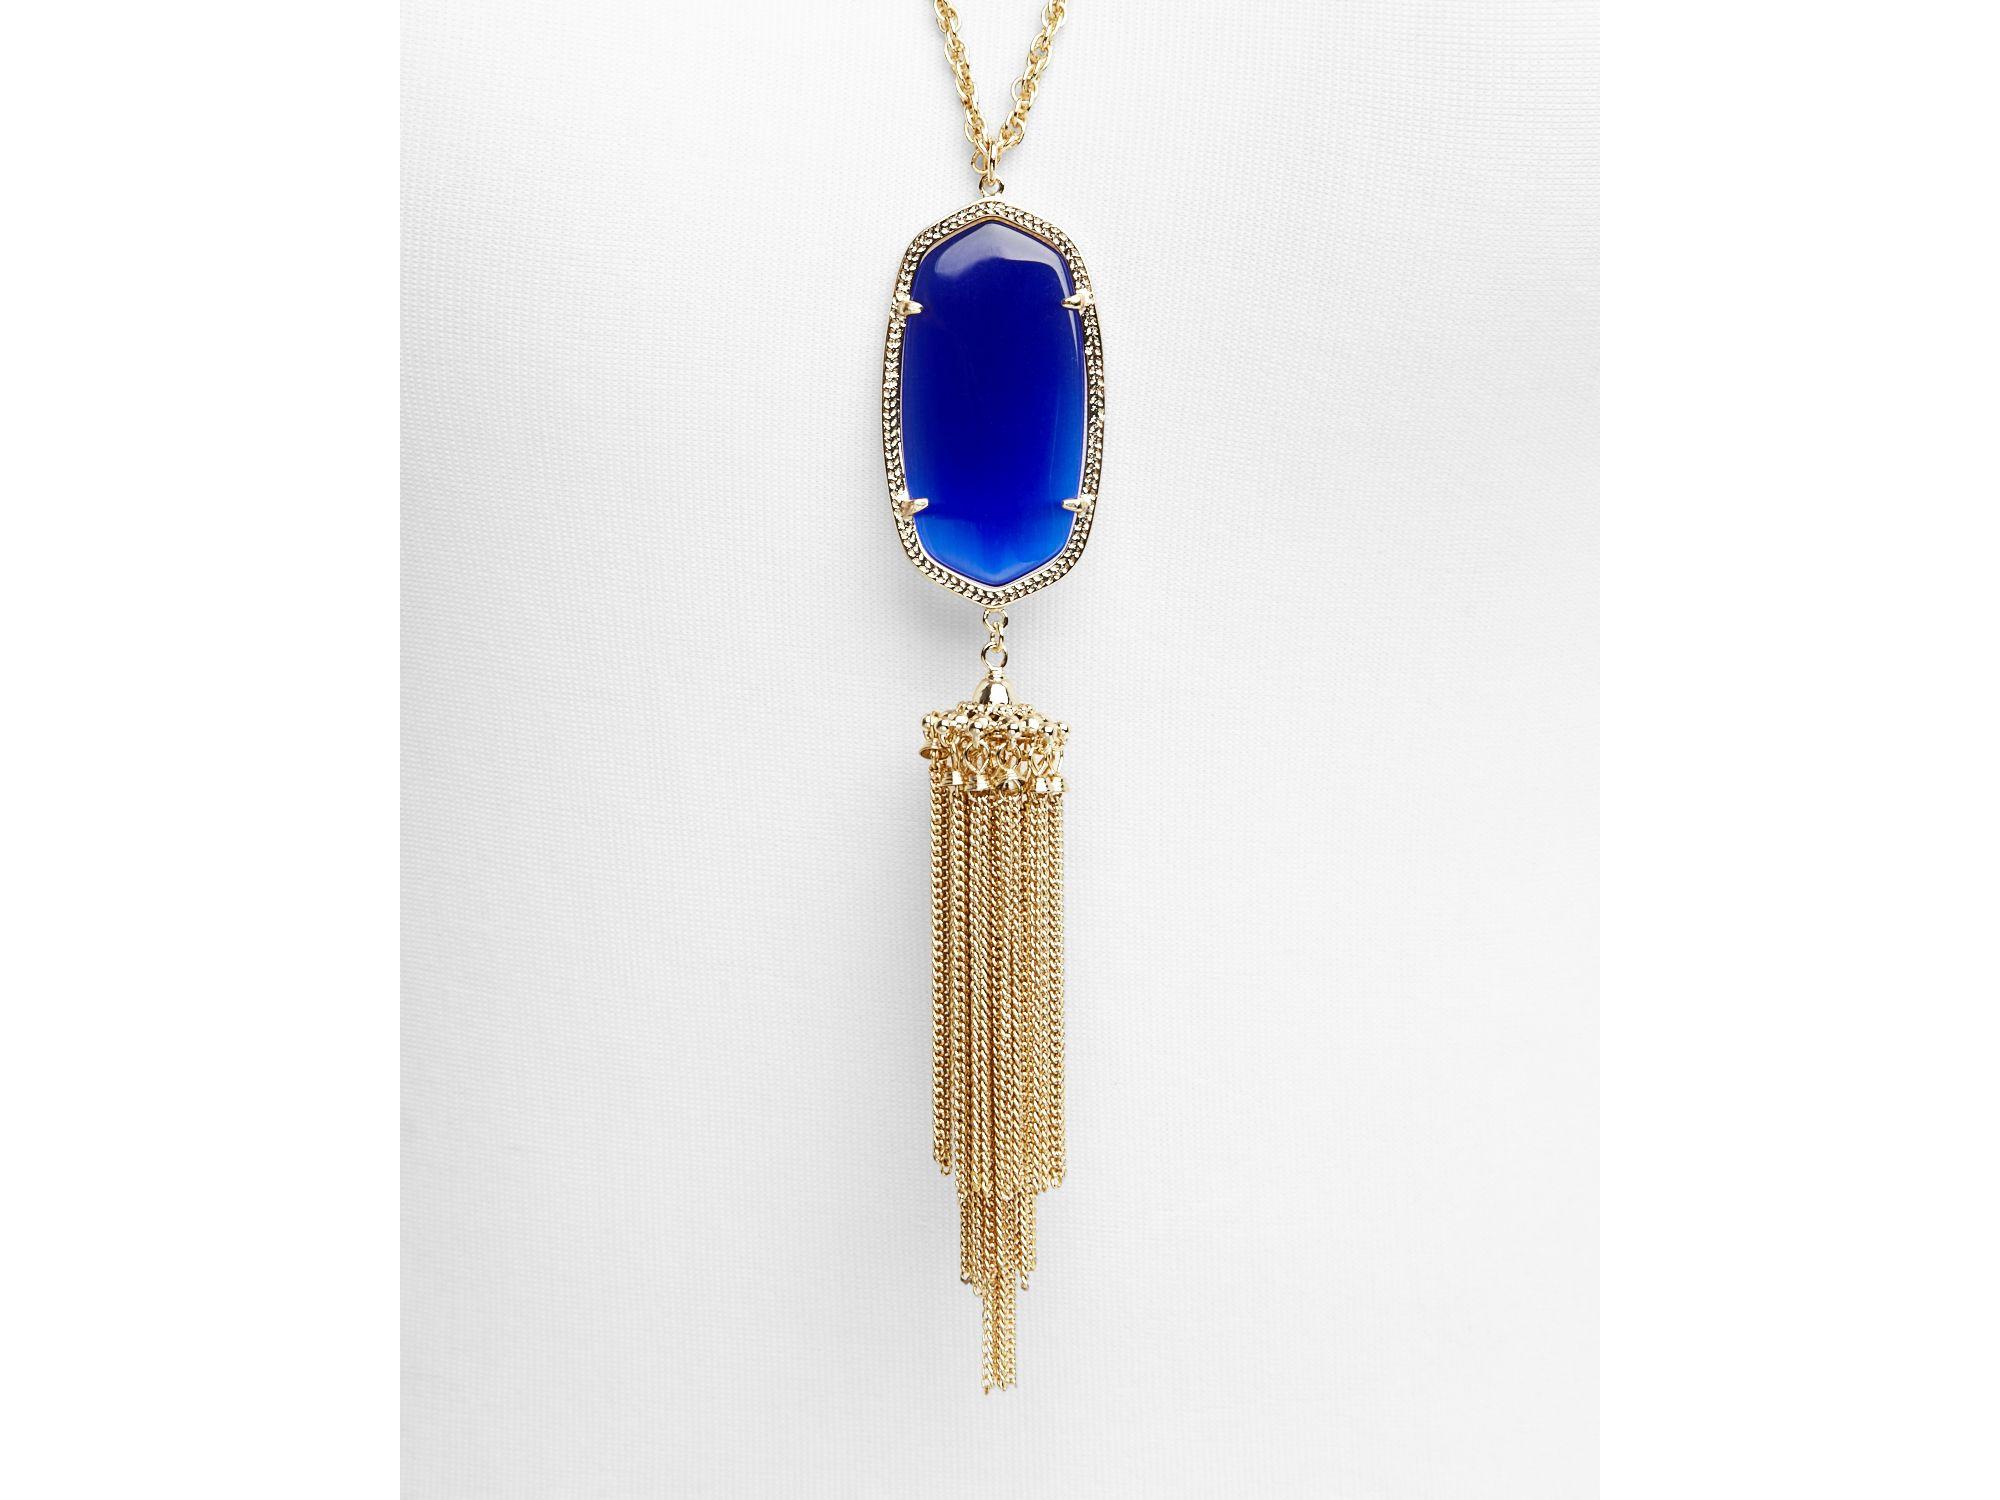 "Kendra Scott Rayne Pendant Necklace, 38"" in Blue"